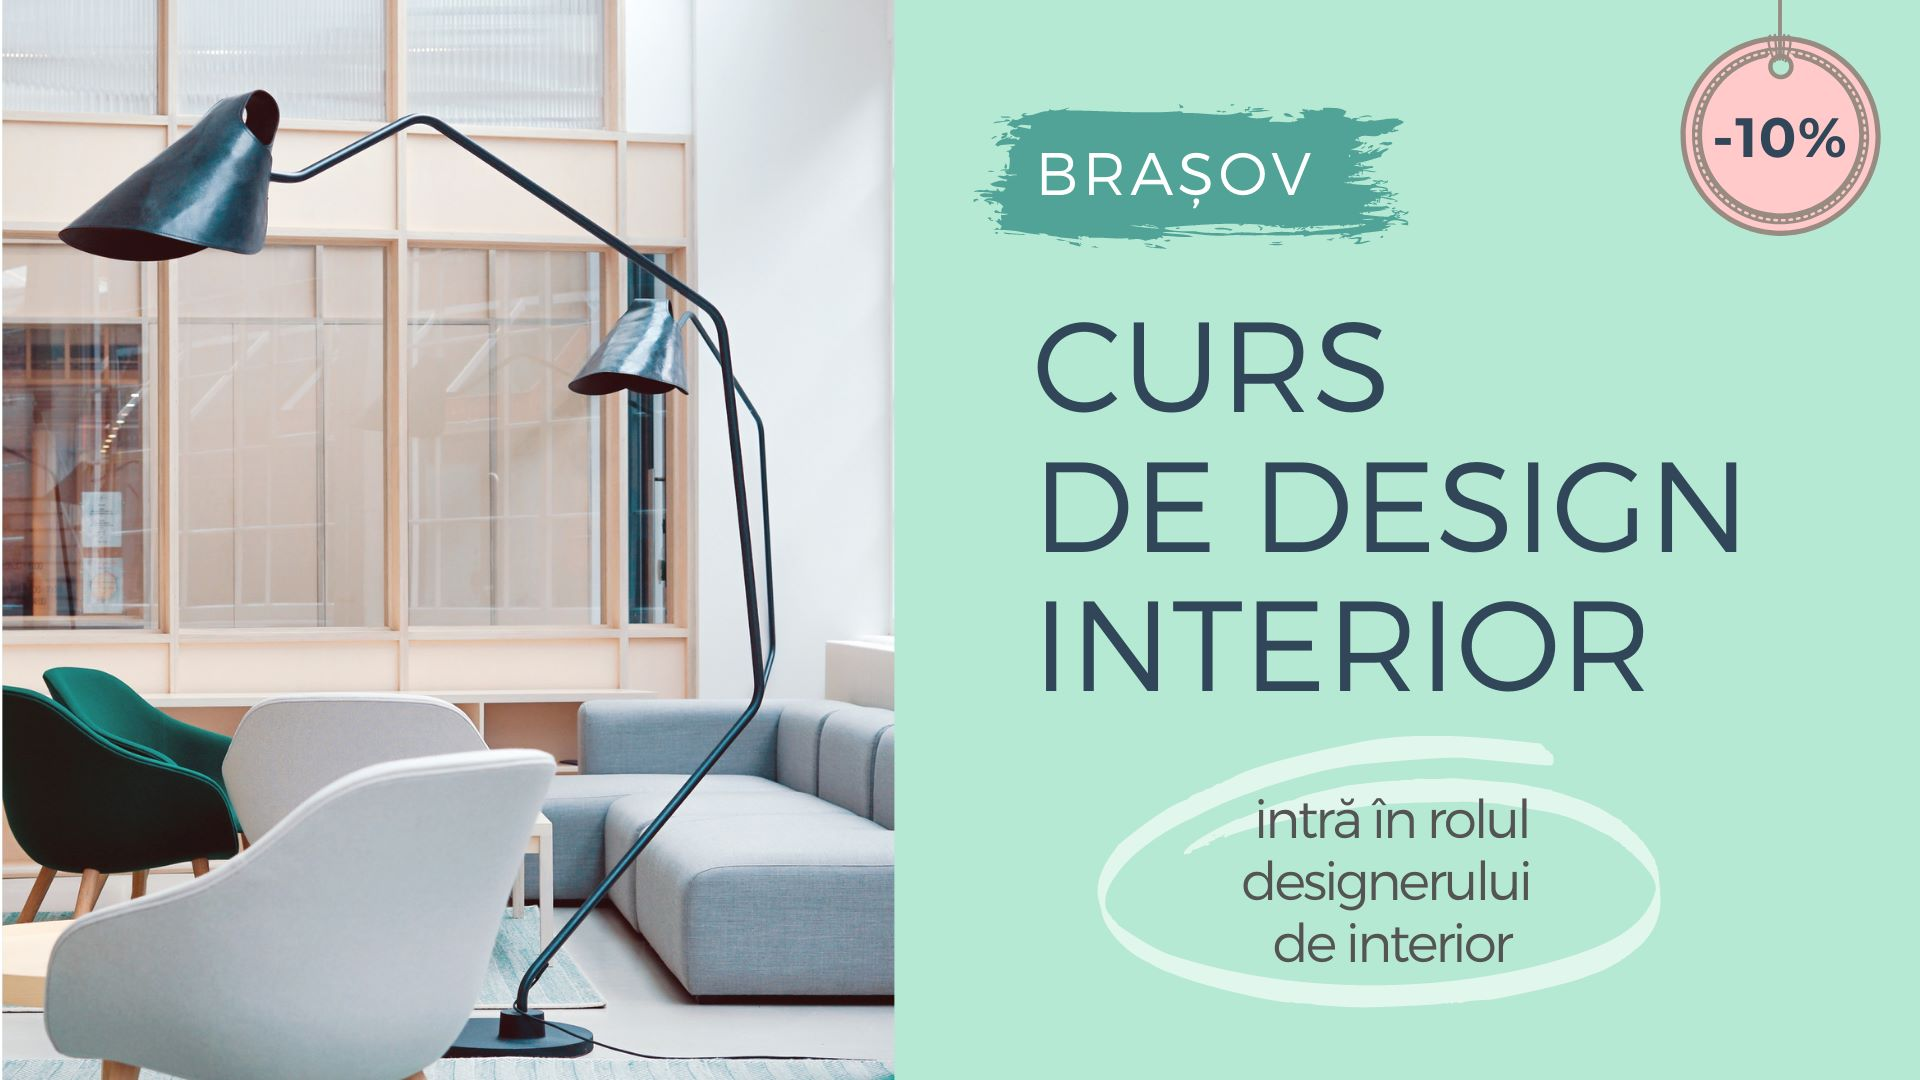 Curs Design Interior | Brașov